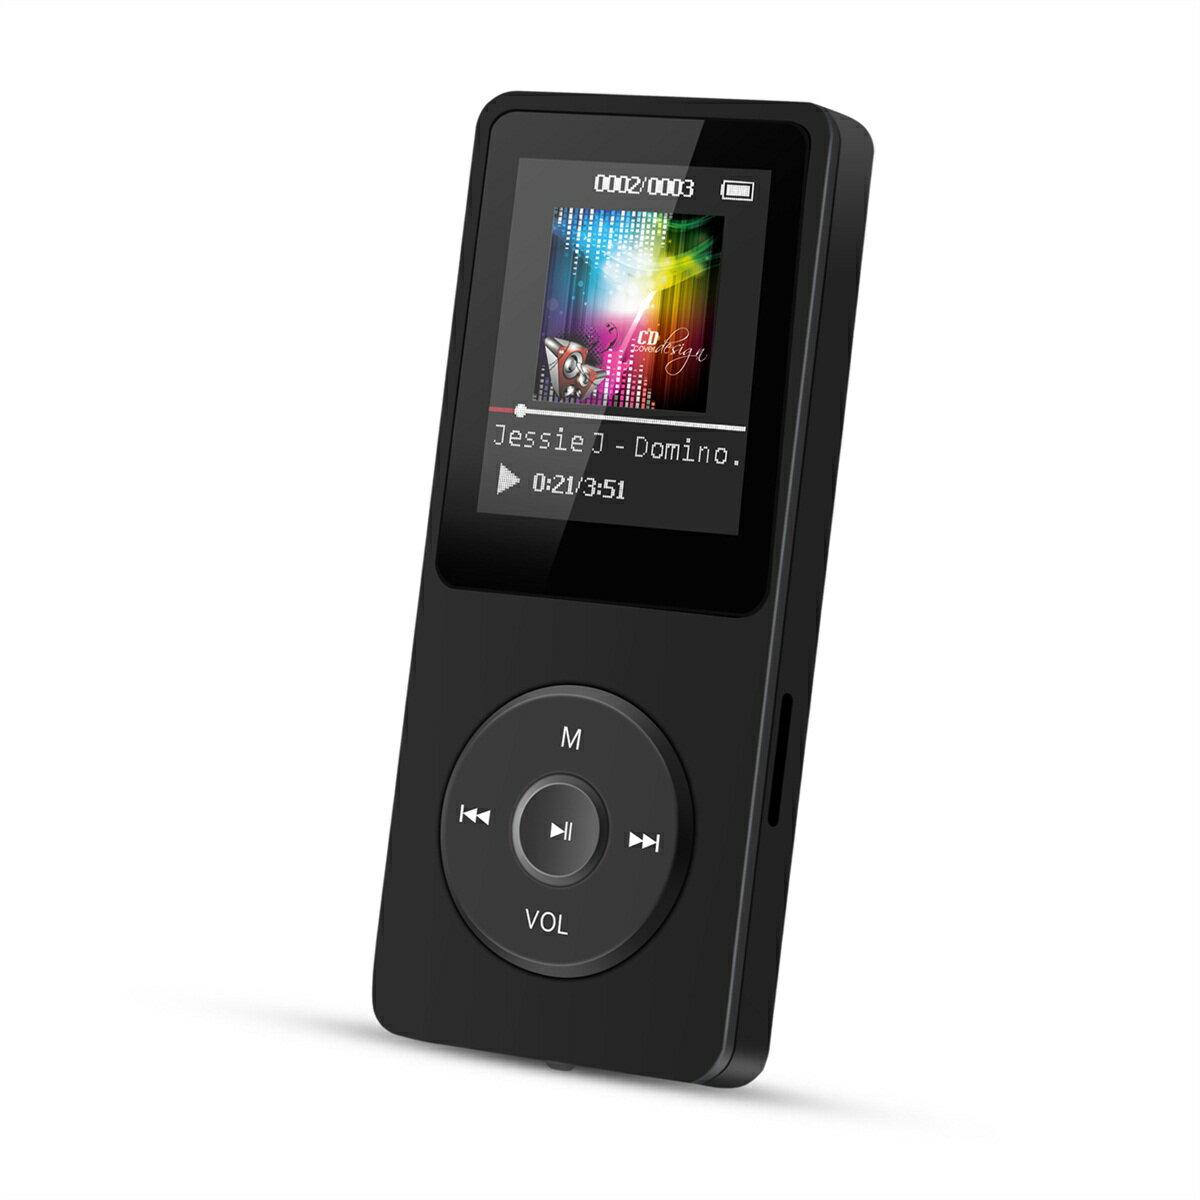 AGPTEK 音楽プレーヤー MP3プレーヤー 新型 最大70再生時間 ロスレス音質 超軽量 内蔵容量8GB マイクロSDカードに対応 ブラック A02